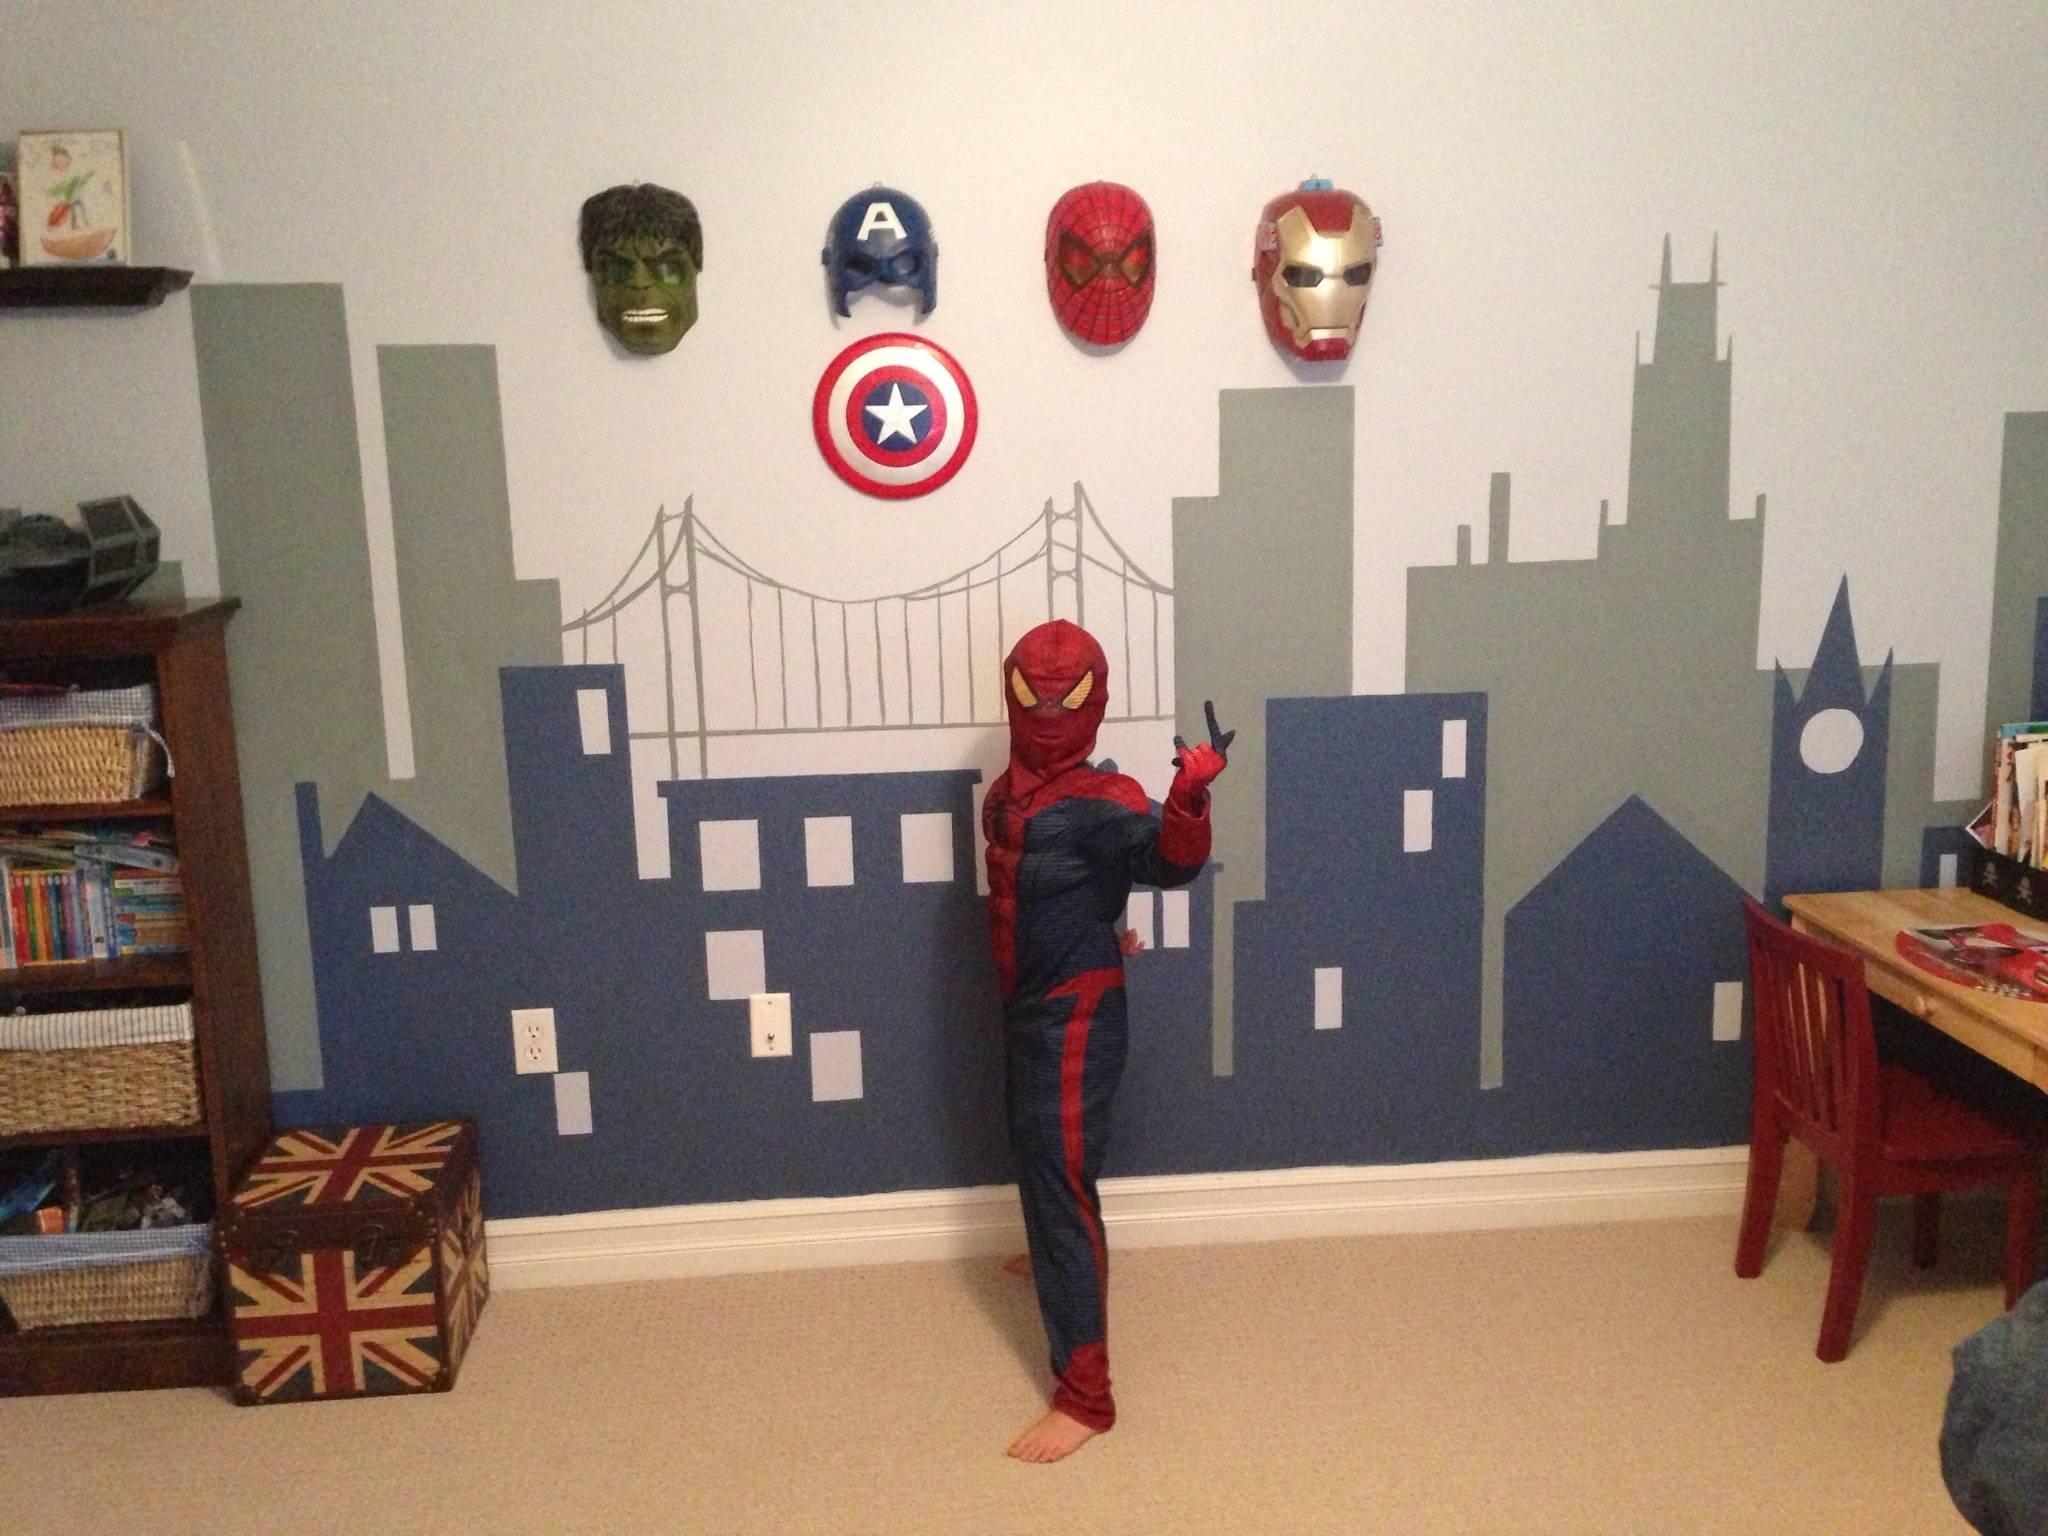 ? Kids Room : Wonderful Kids Room Wall Decor Ideas Inspiration With Regard To 2018 Superhero Wall Art For Kids (View 14 of 25)